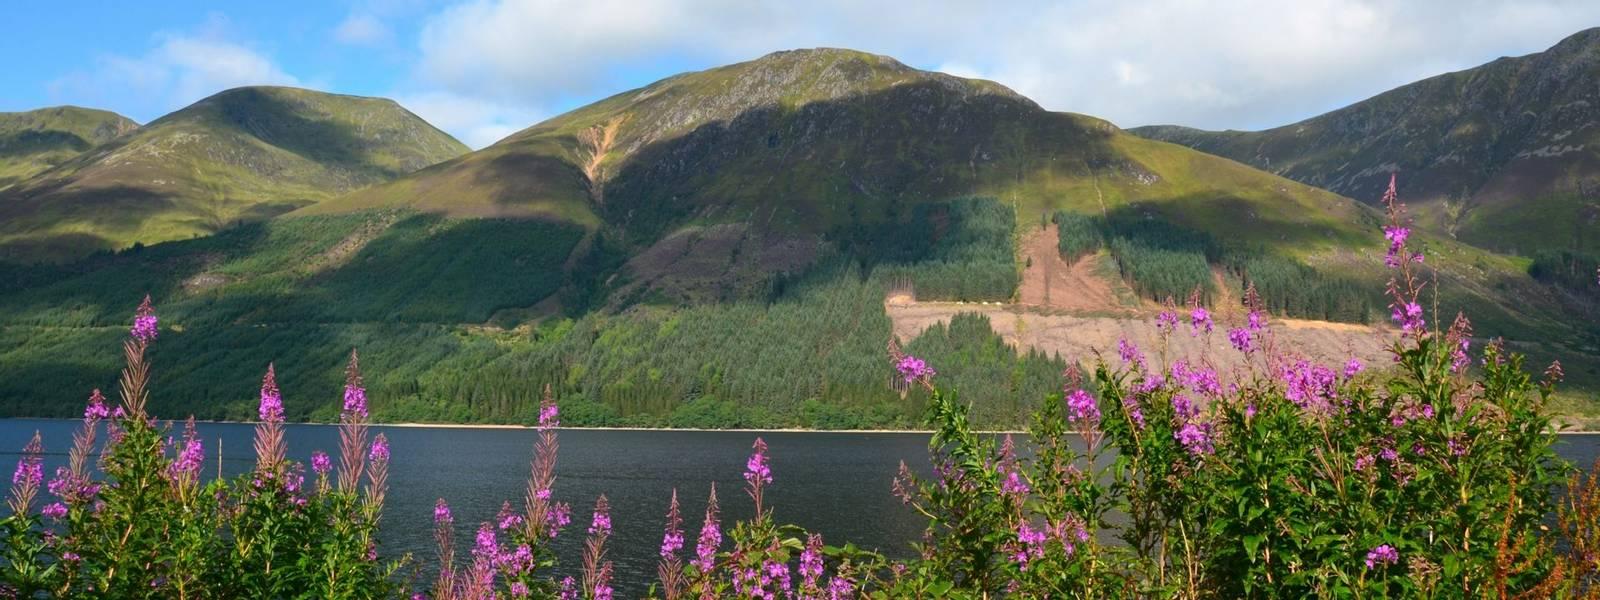 Scottish Highlands - Walking With Sightseeing - AdobeStock_51201819.jpeg